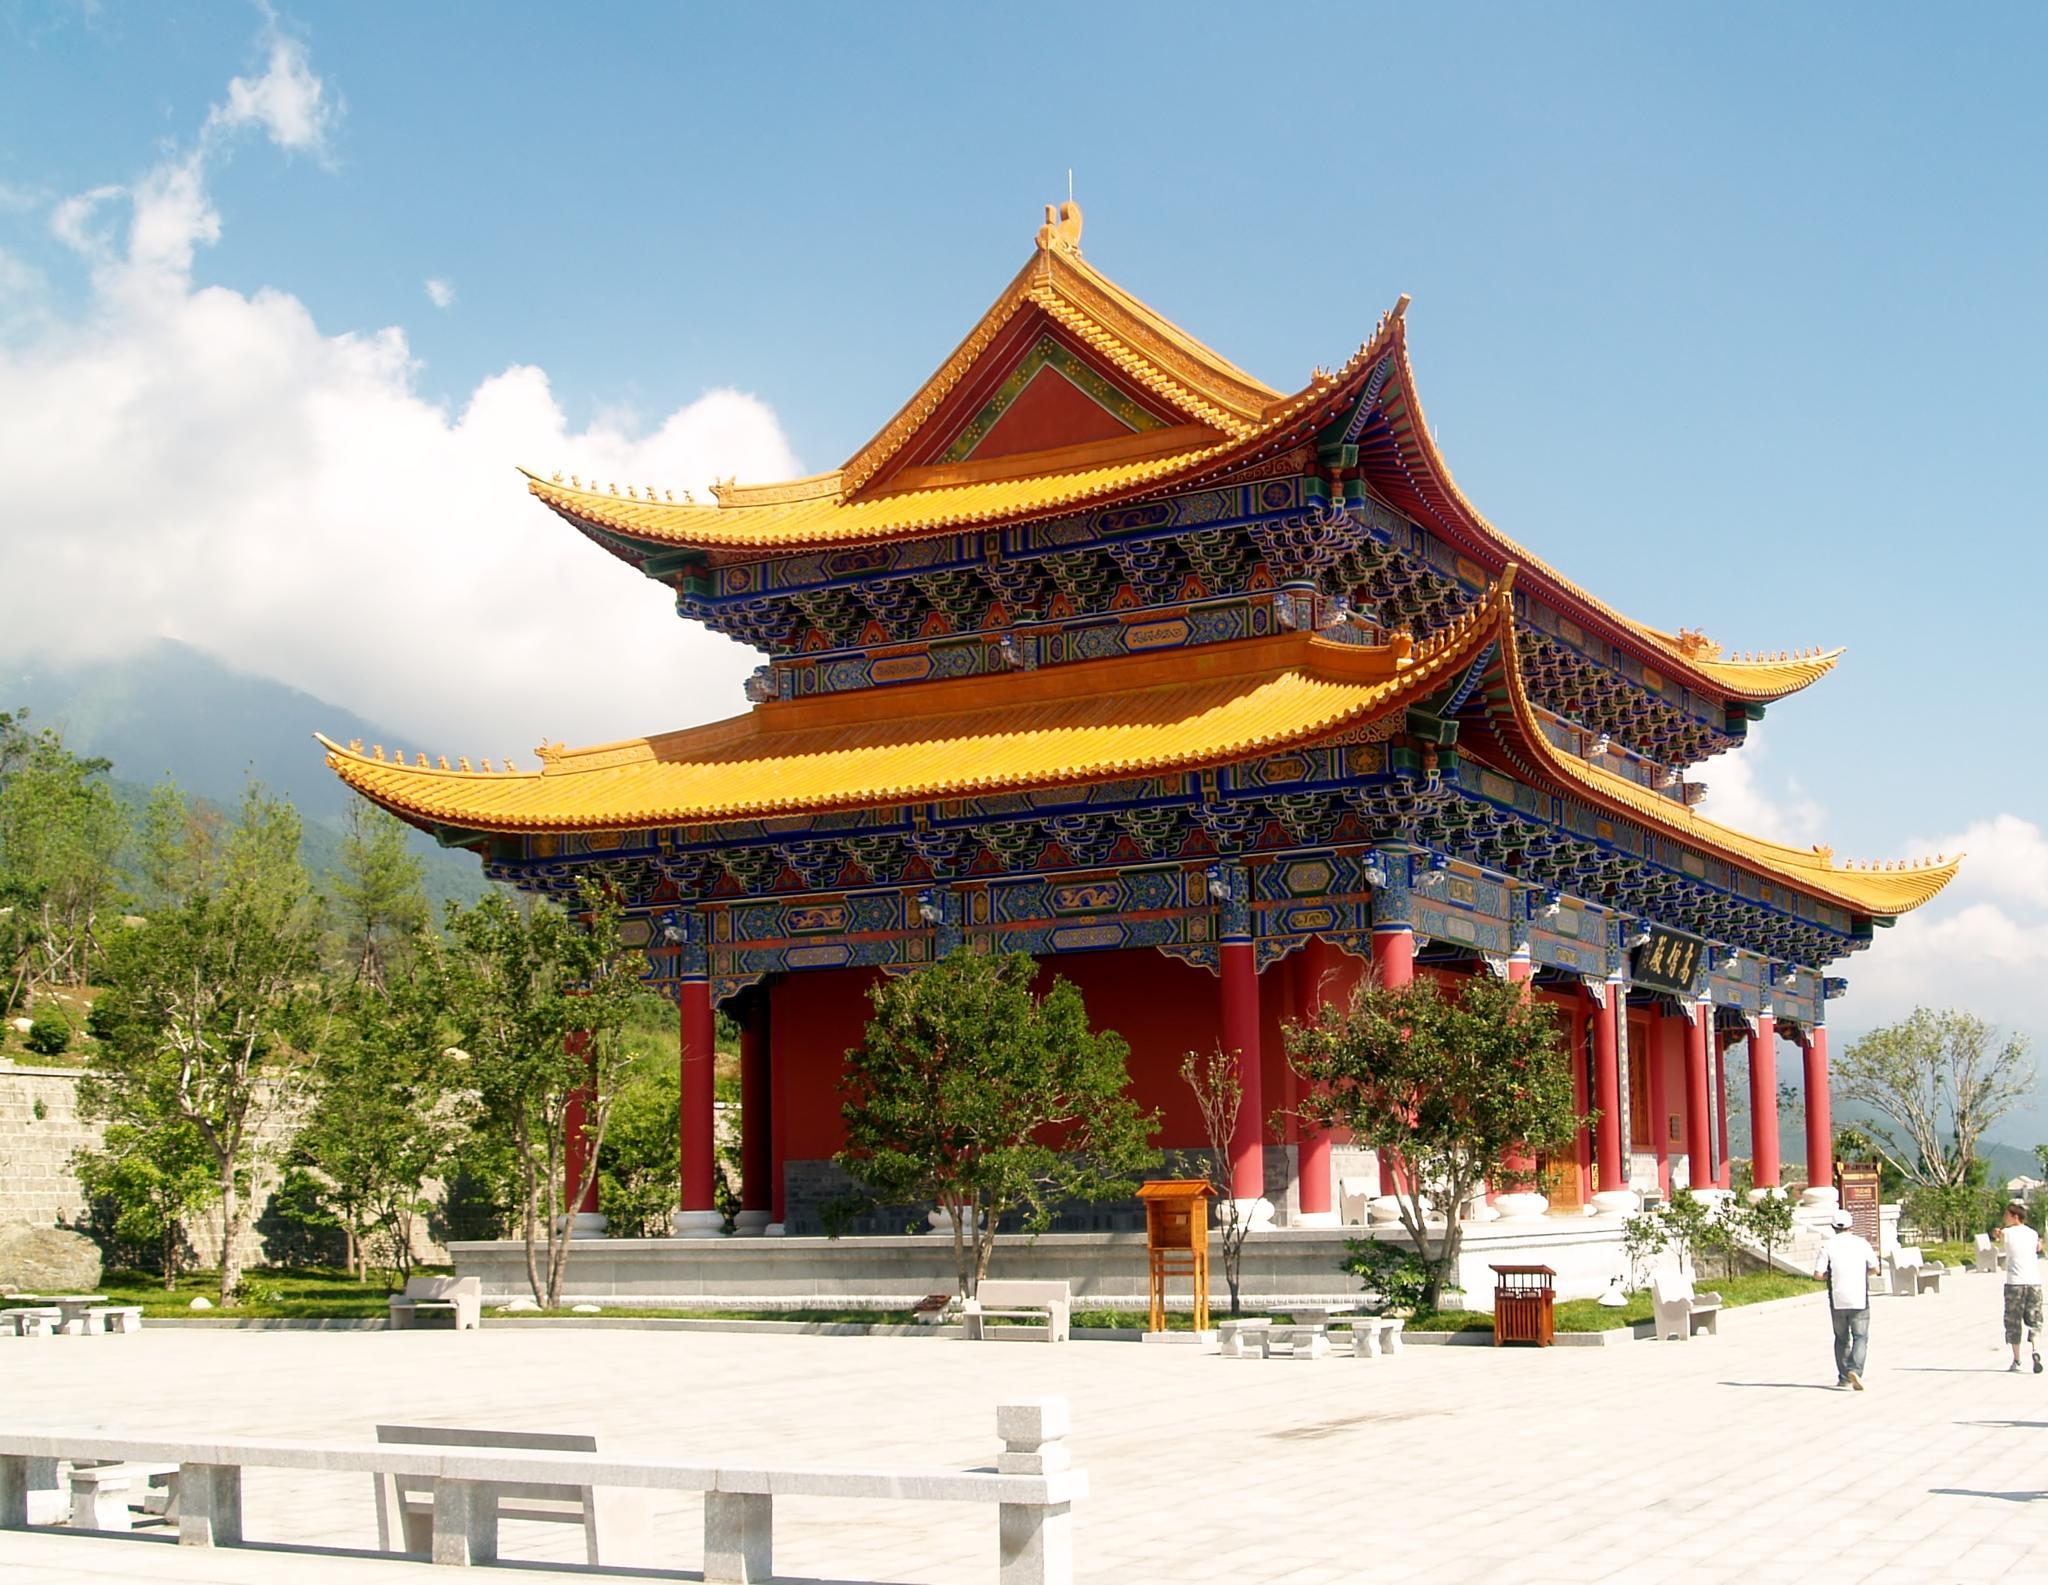 colorful temple by ester.ayerdi